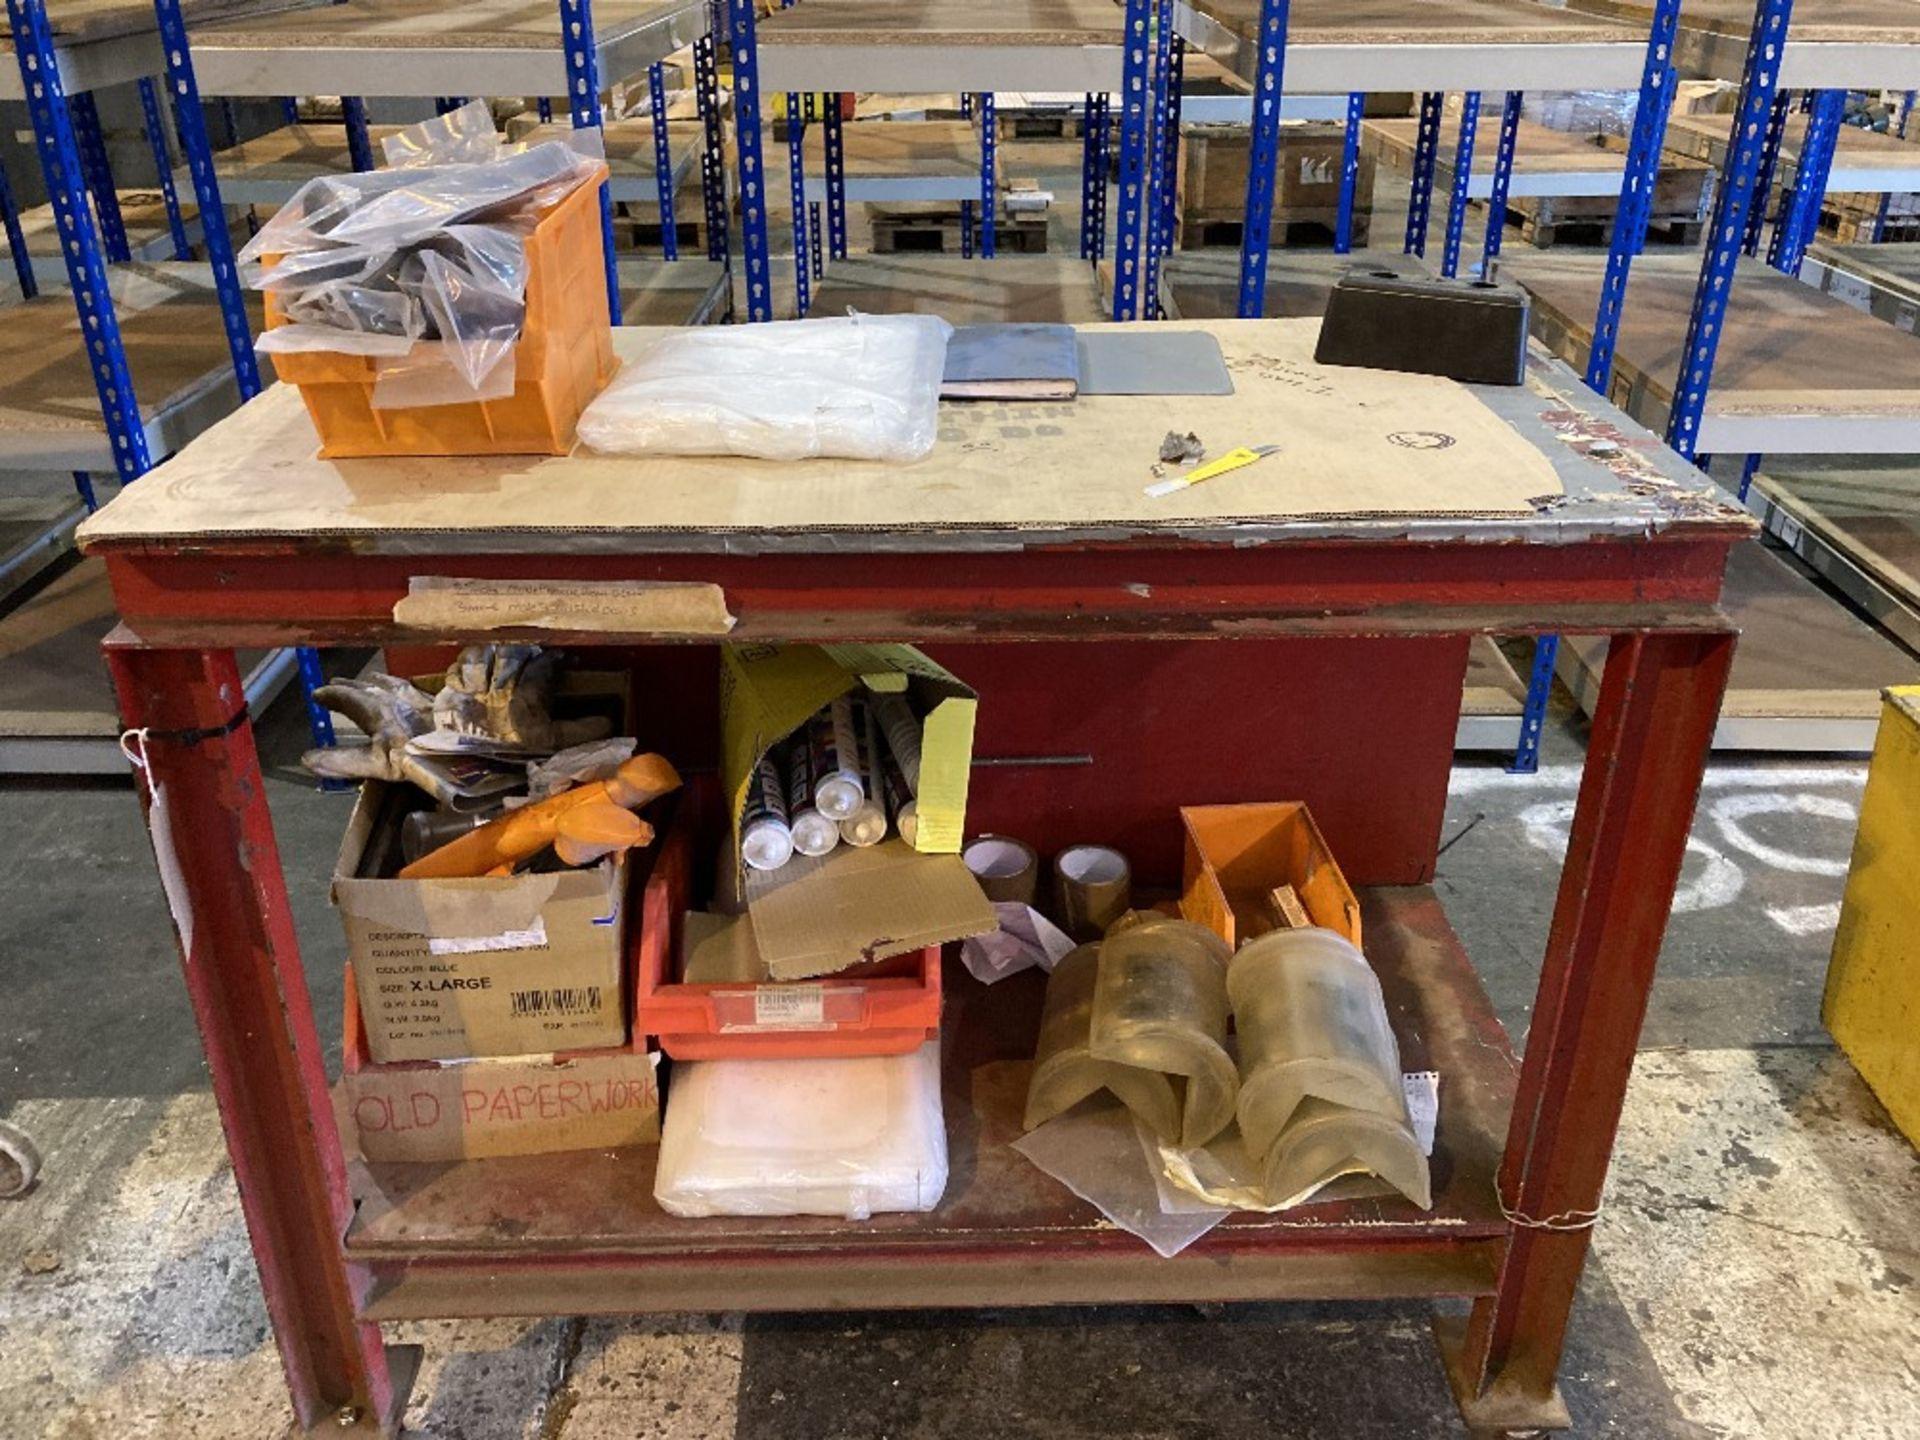 Steel framed mobile workbench - Image 2 of 3